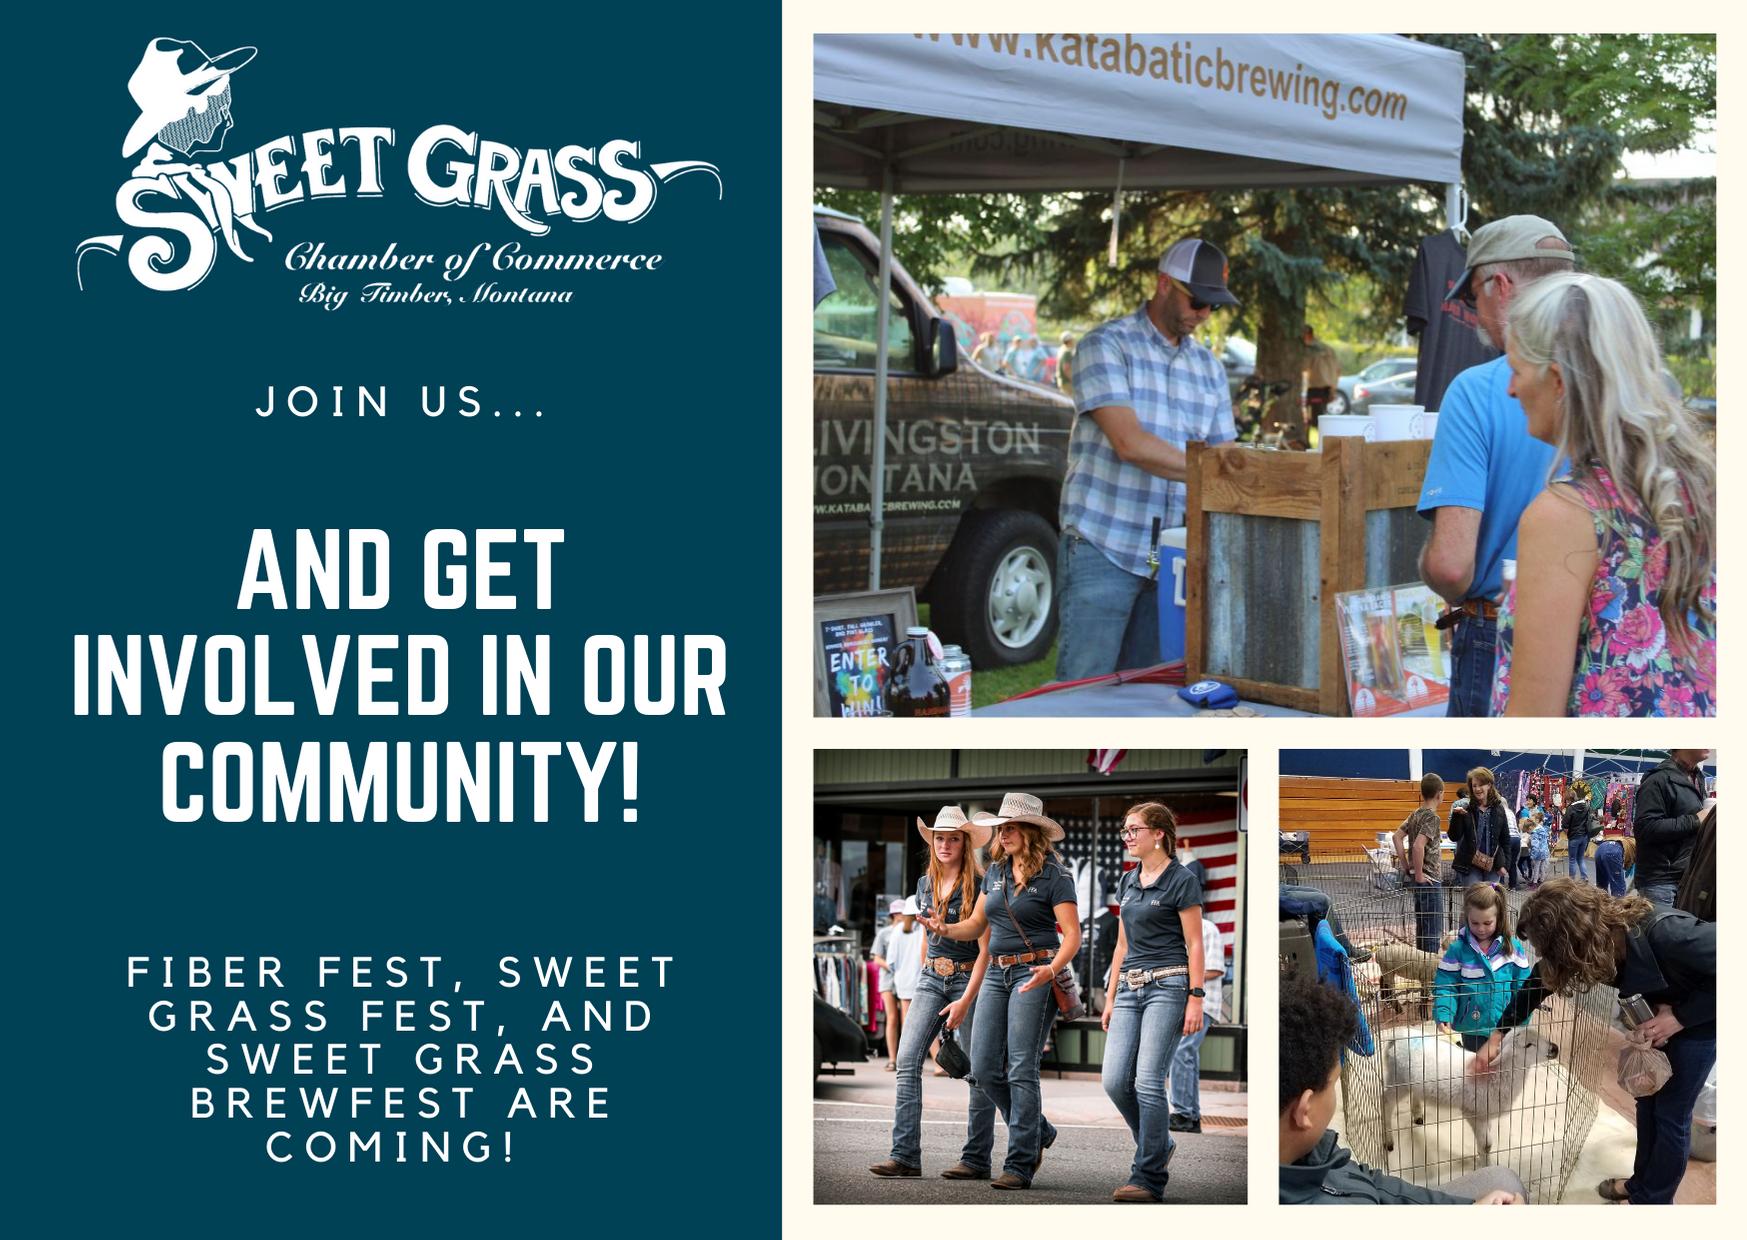 joinus events sweet grass fest fiberfest brewfest community volunteer big timber montana